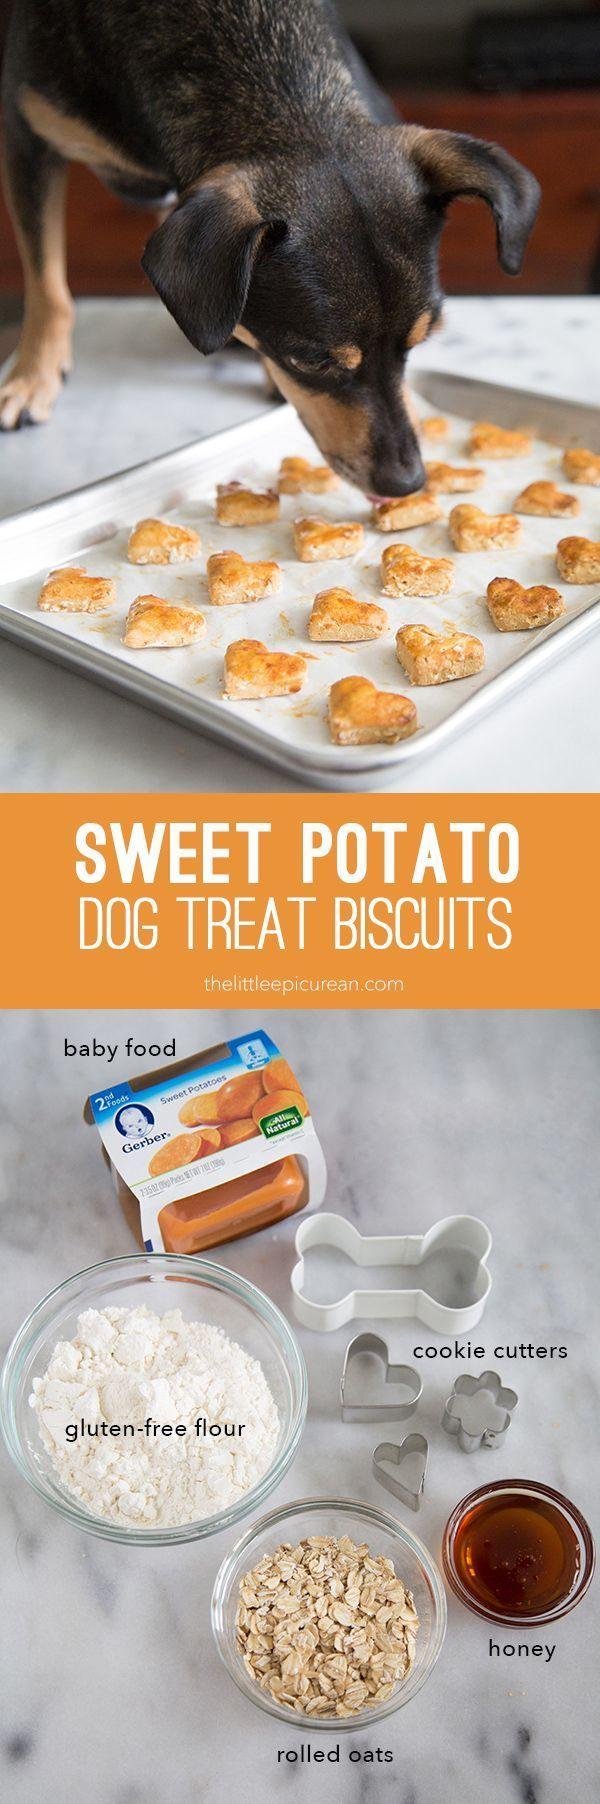 Sweet Potato Dog Treat Biscuits